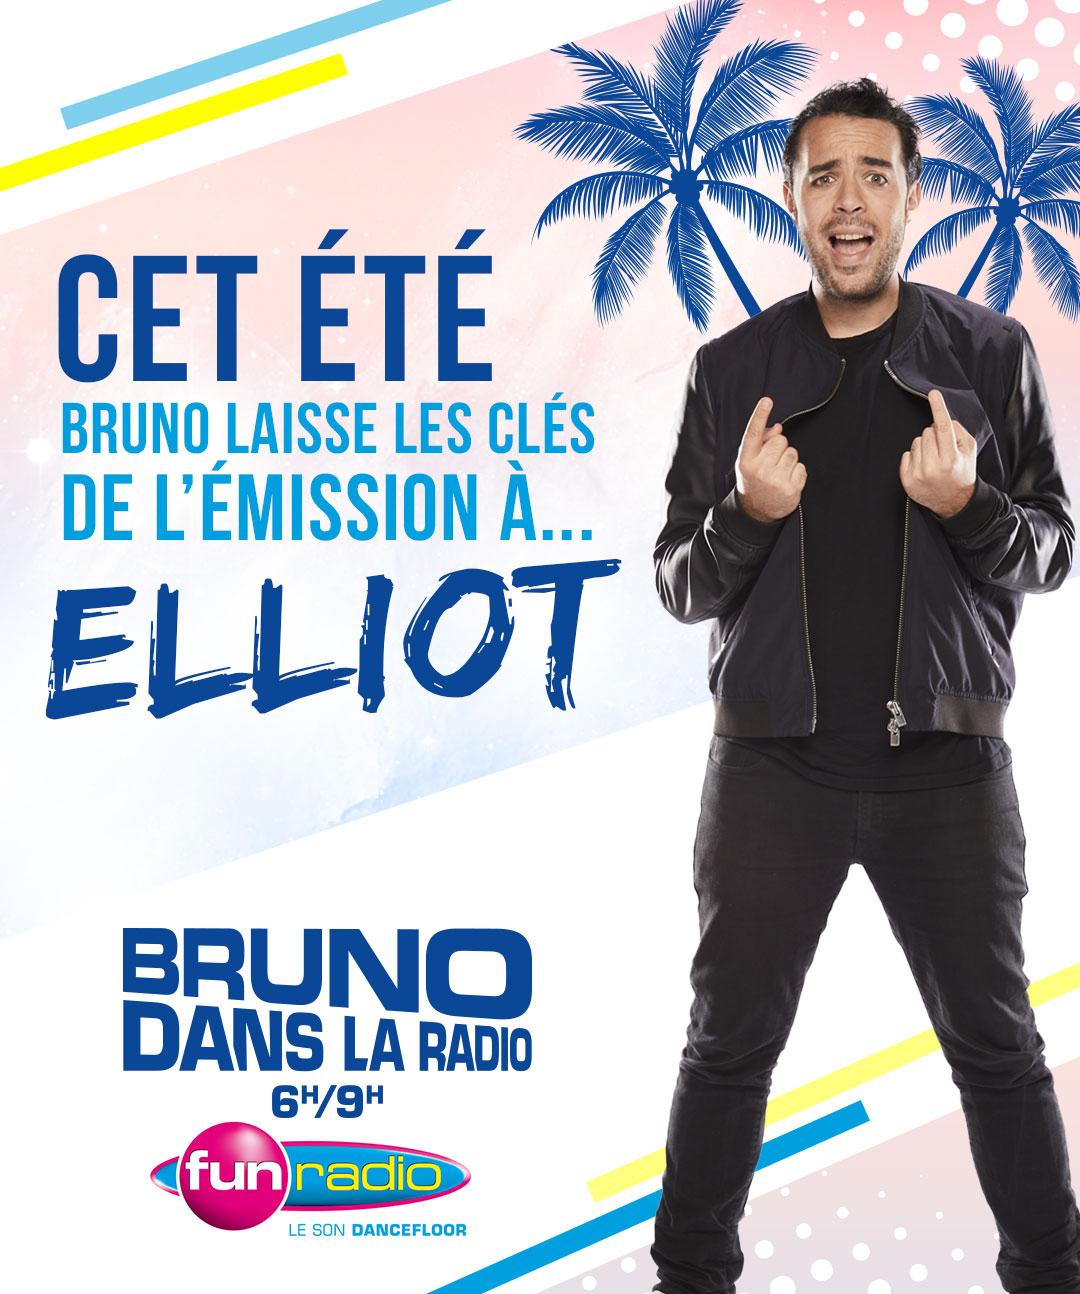 Elliot nouveau patron du Morning de Fun Radio